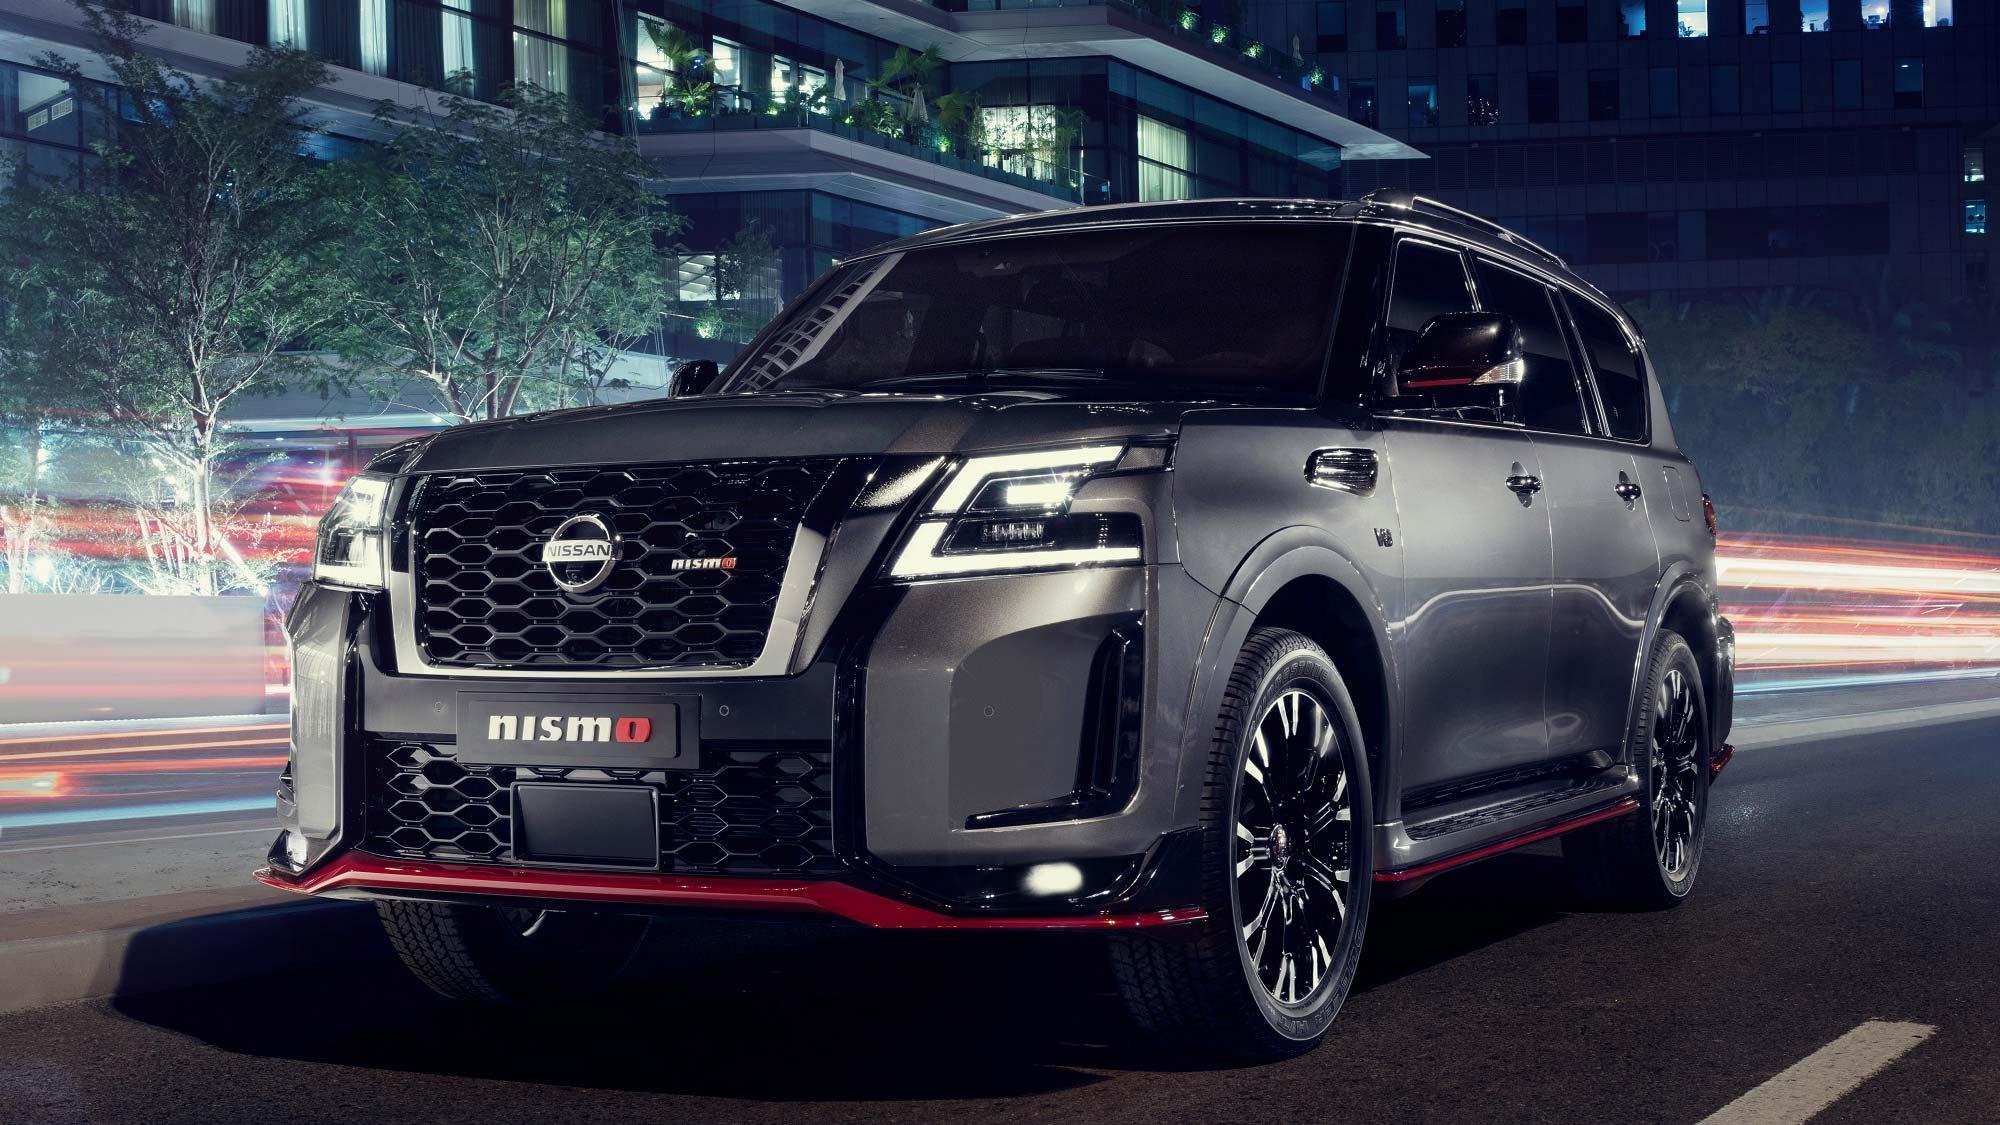 2021 Nissan Patrol NISMO SUV